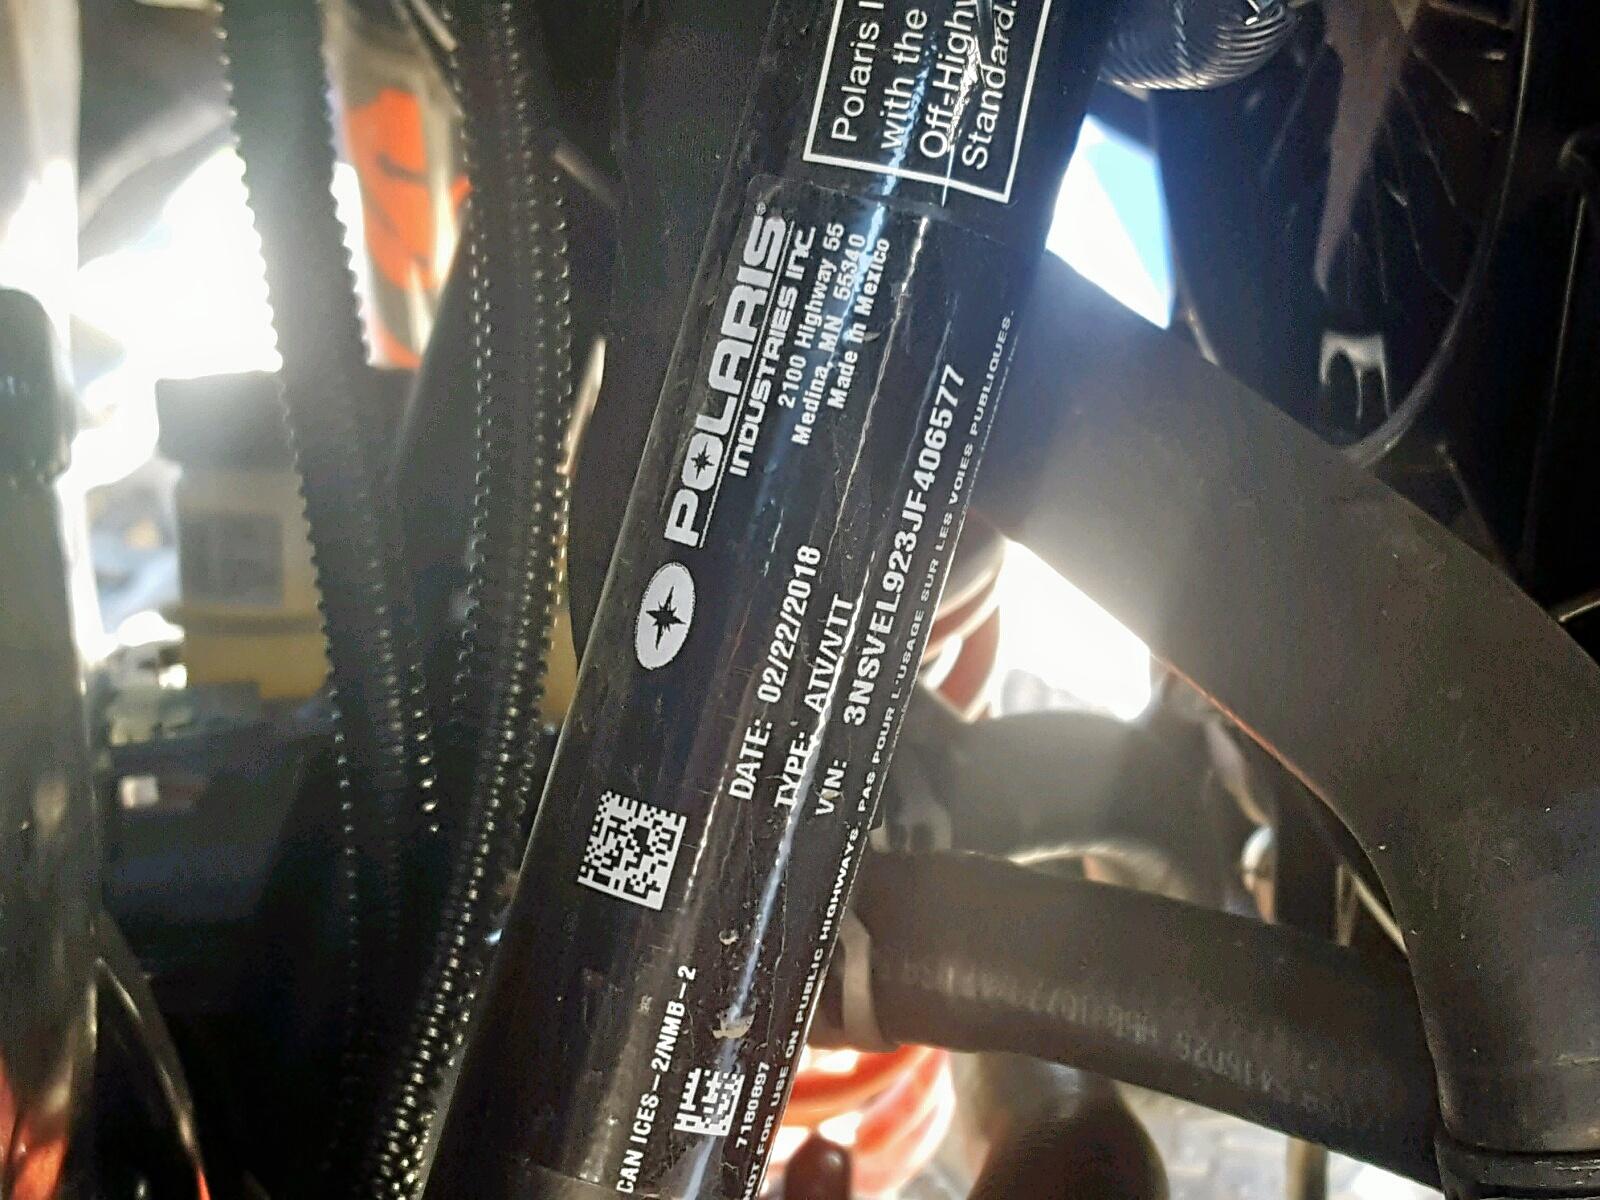 2018 Polaris Rzr Xp Tur 2 in CO - Denver South (3NSVEL923JF406577